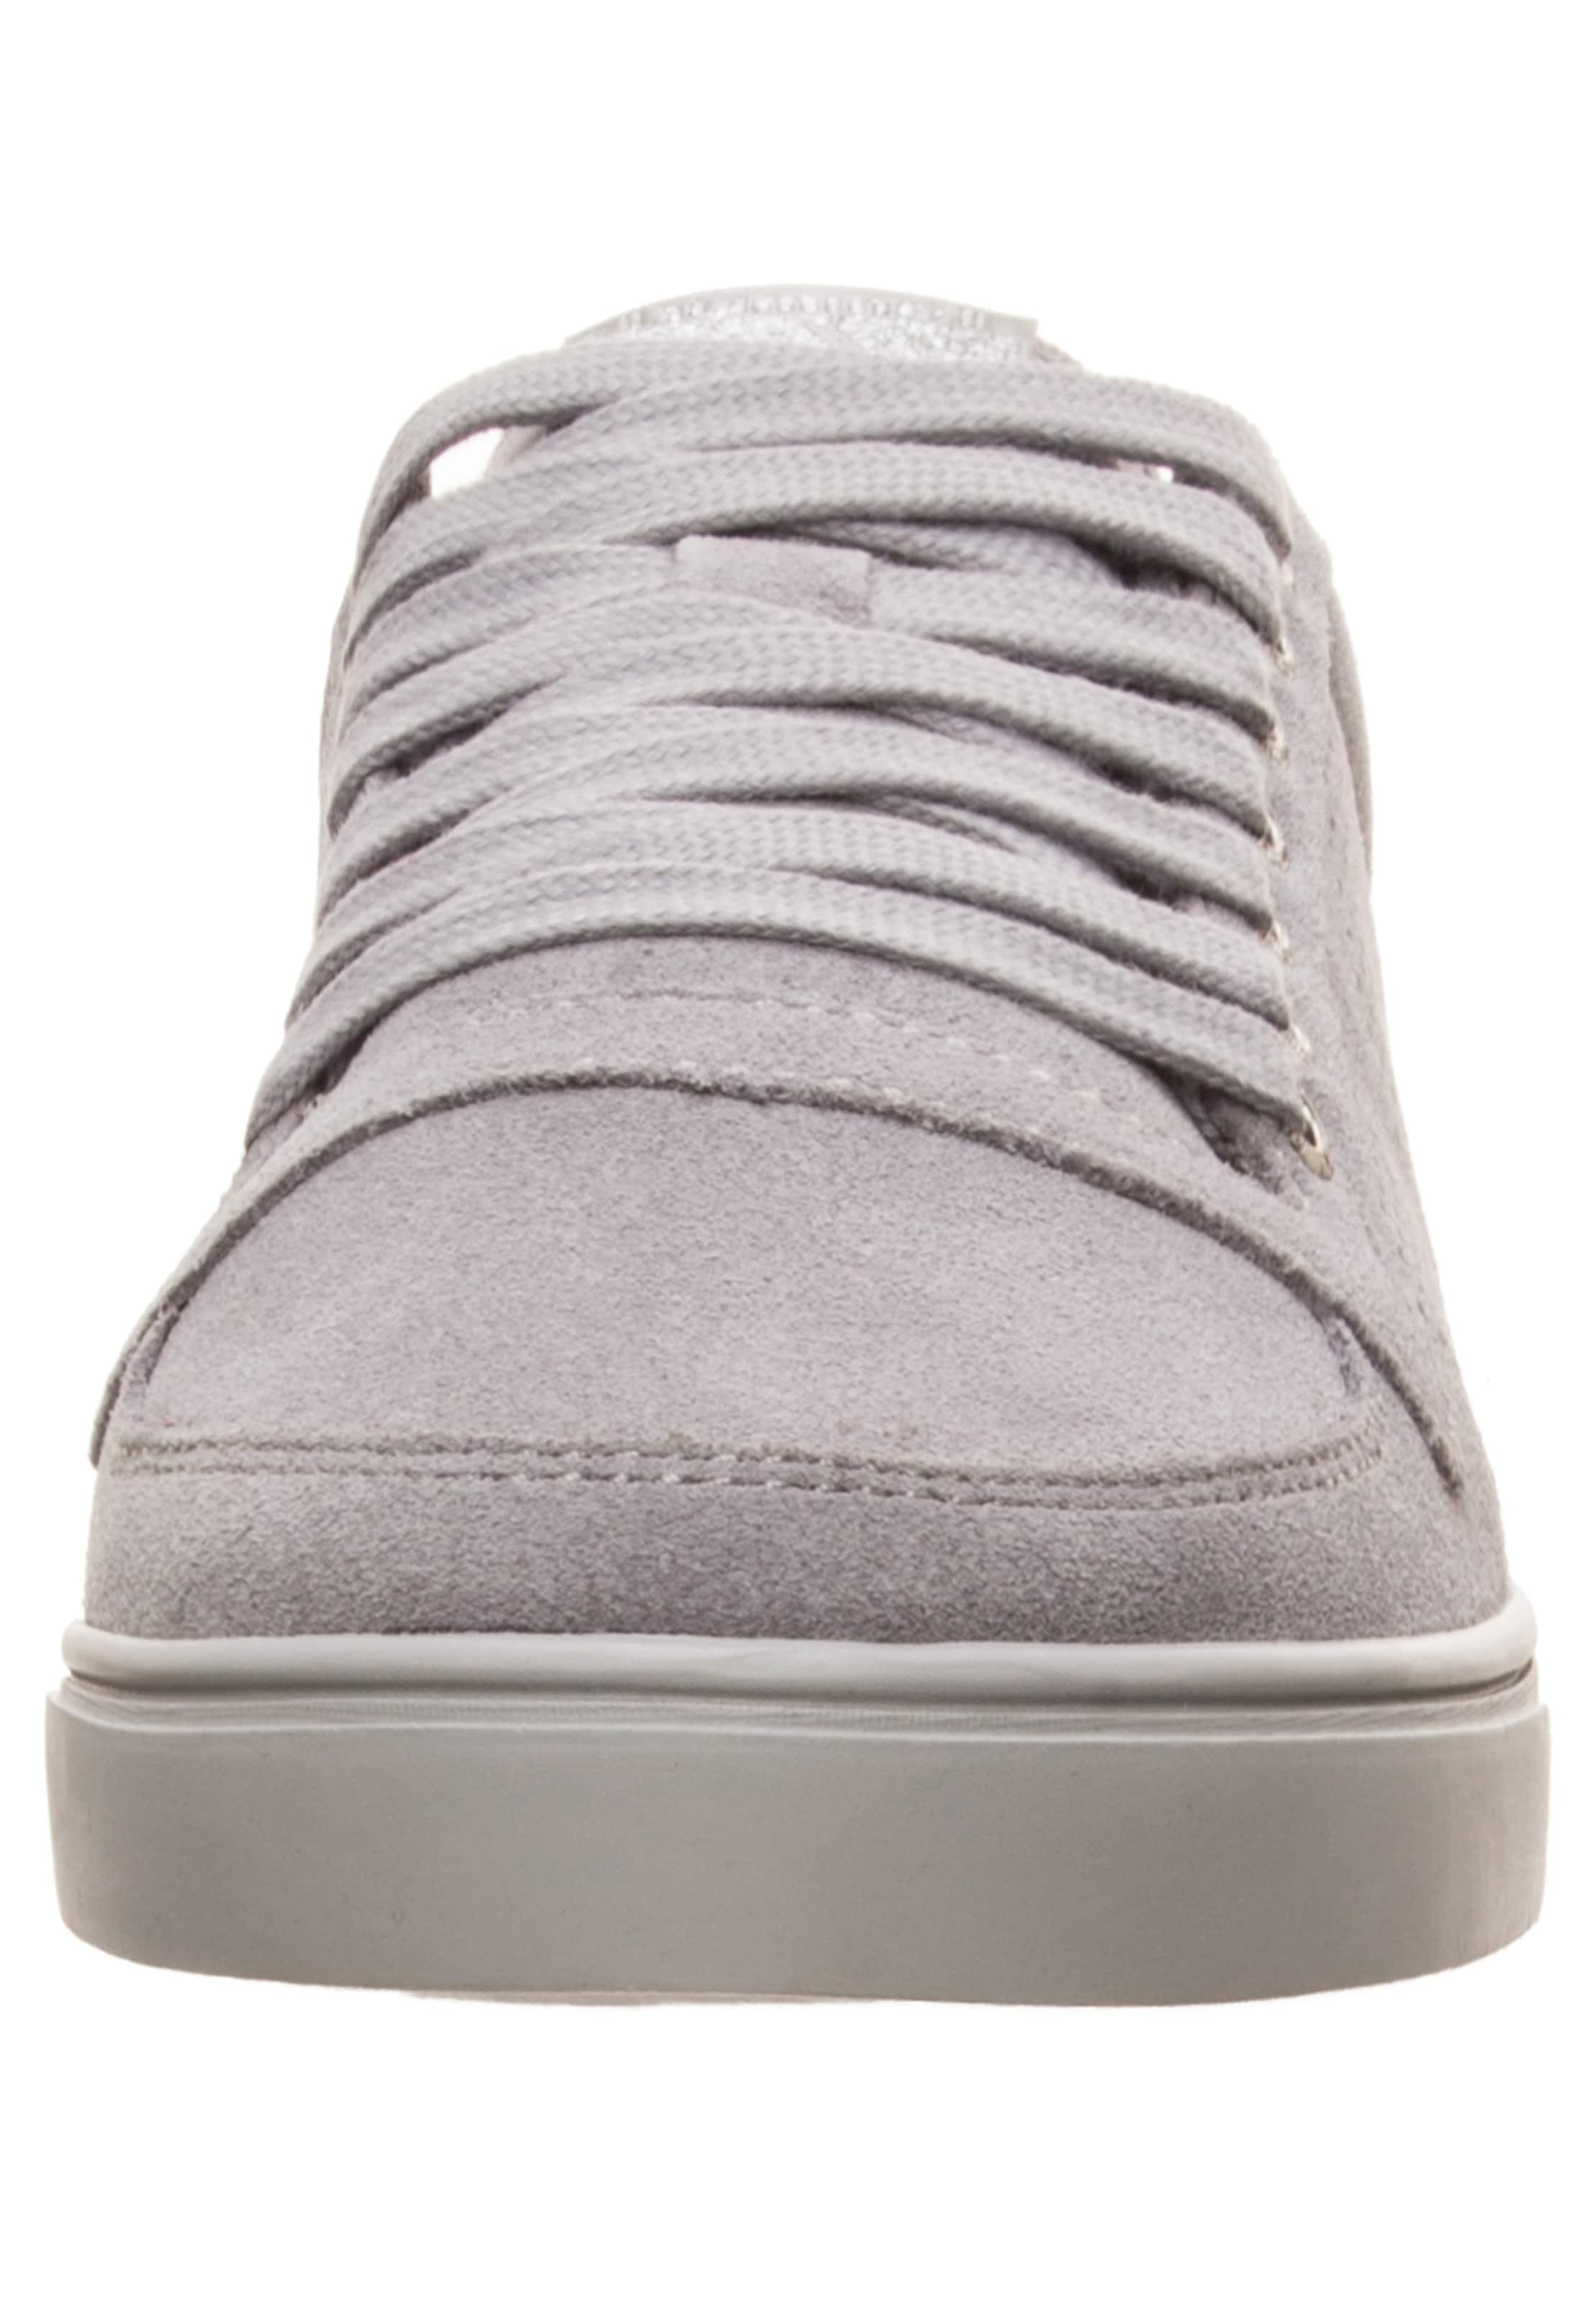 Sneaker Hummel Hummel In In Hummel Taupe Sneaker Sneaker Taupe Nnv0wm8